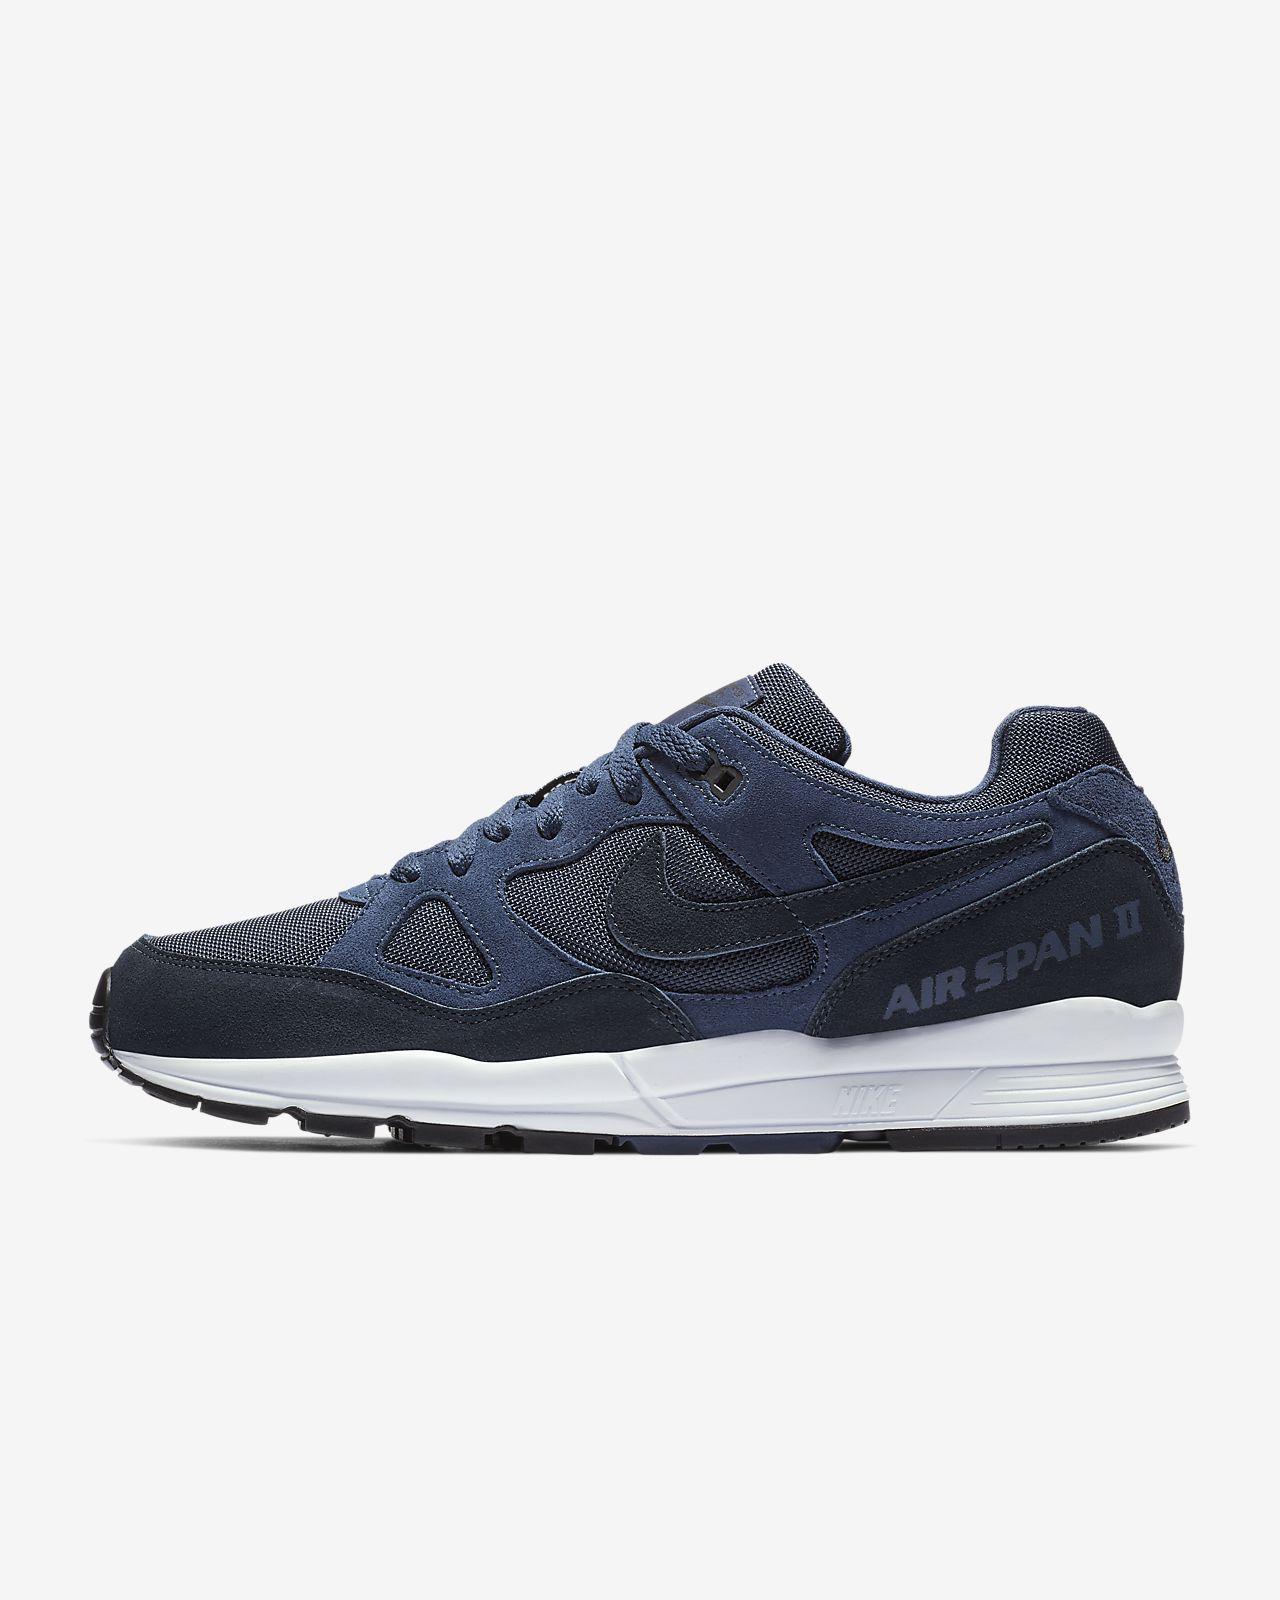 Nike Air Span II SE Men's Shoe